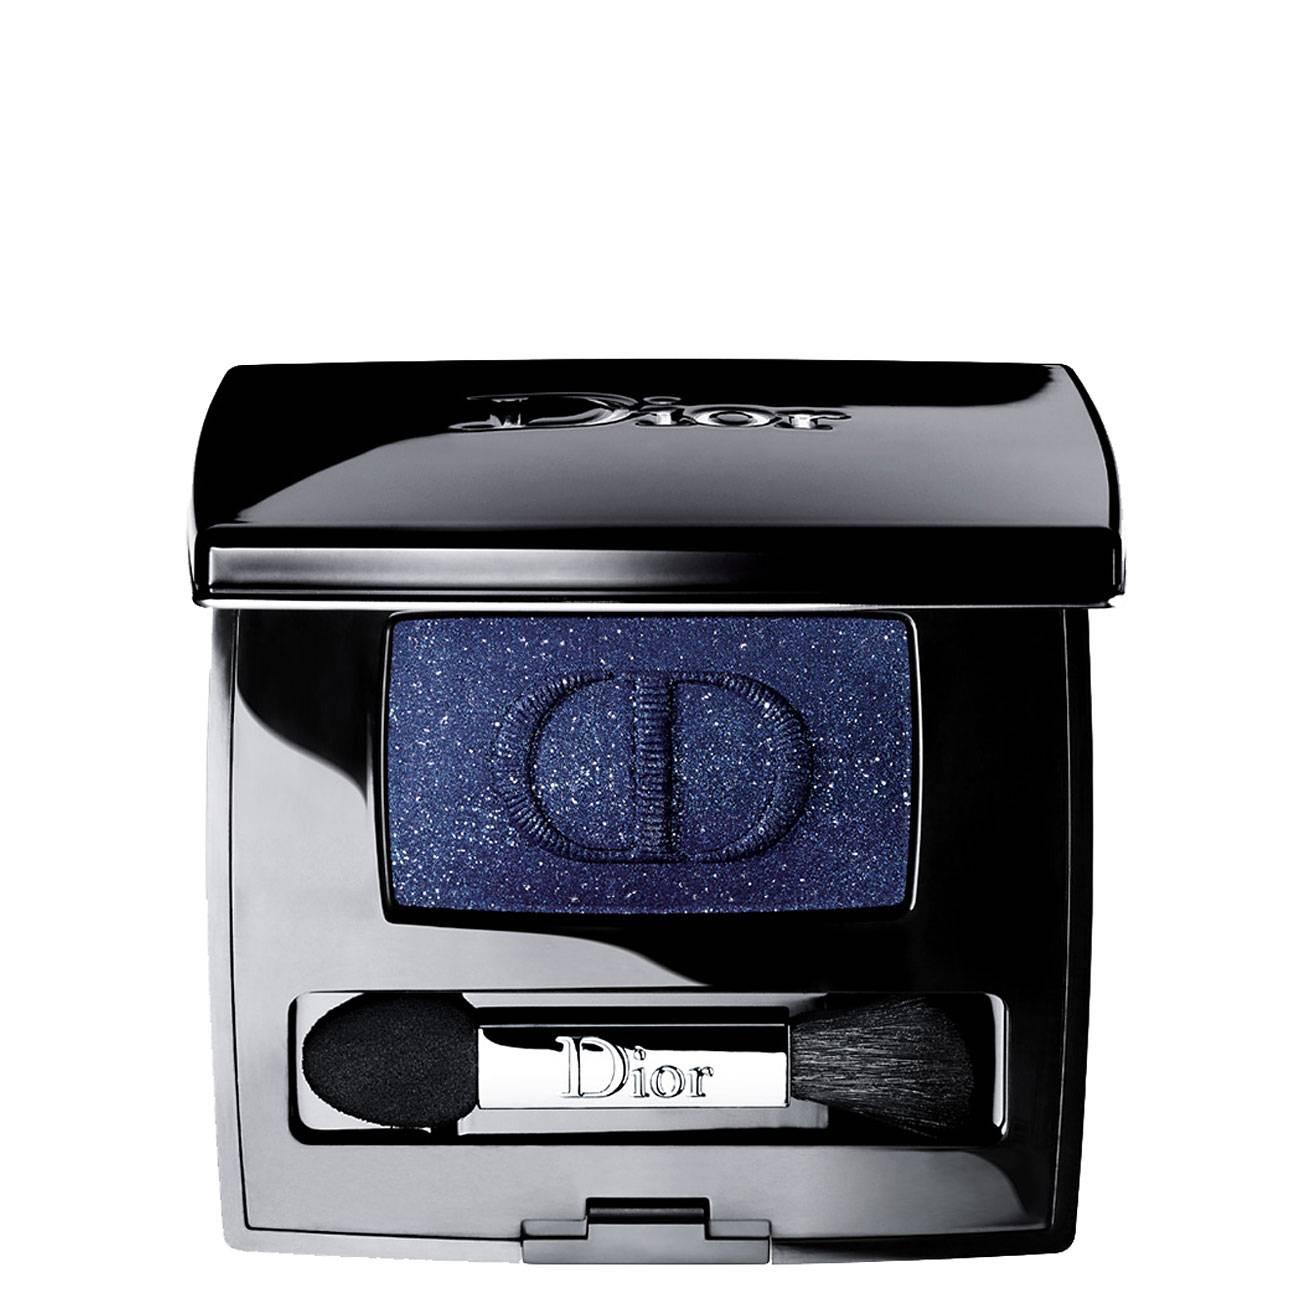 Diorshow Fusion Mono - 2 Gr 296-Show Dior imagine 2021 bestvalue.eu